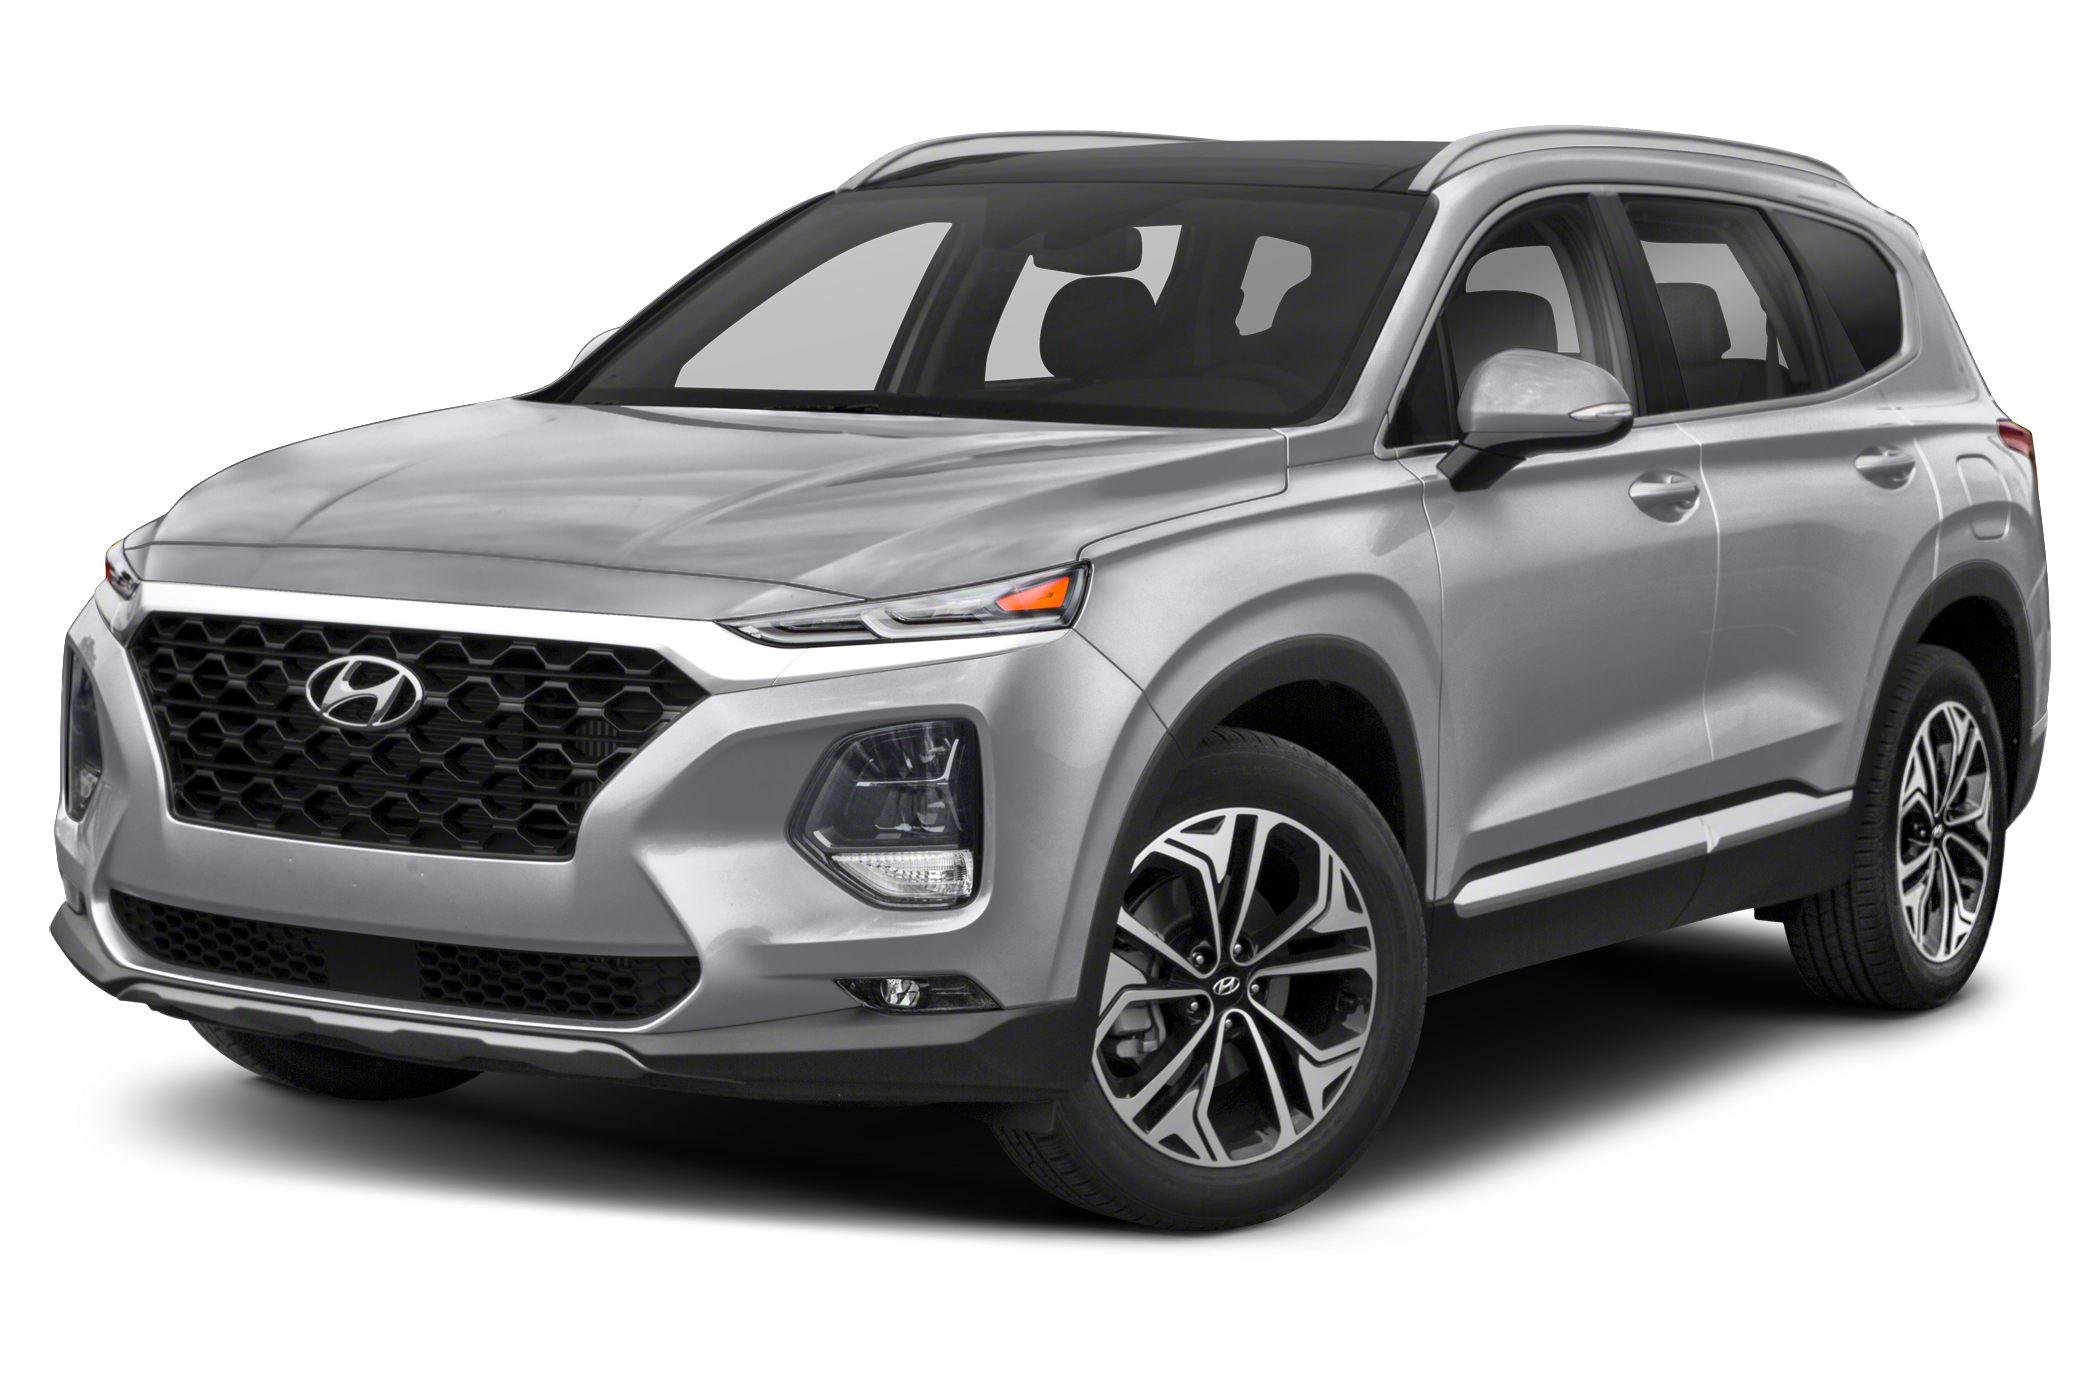 2020 Hyundai Santa Fe Limited 2.4 4dr All-wheel Drive